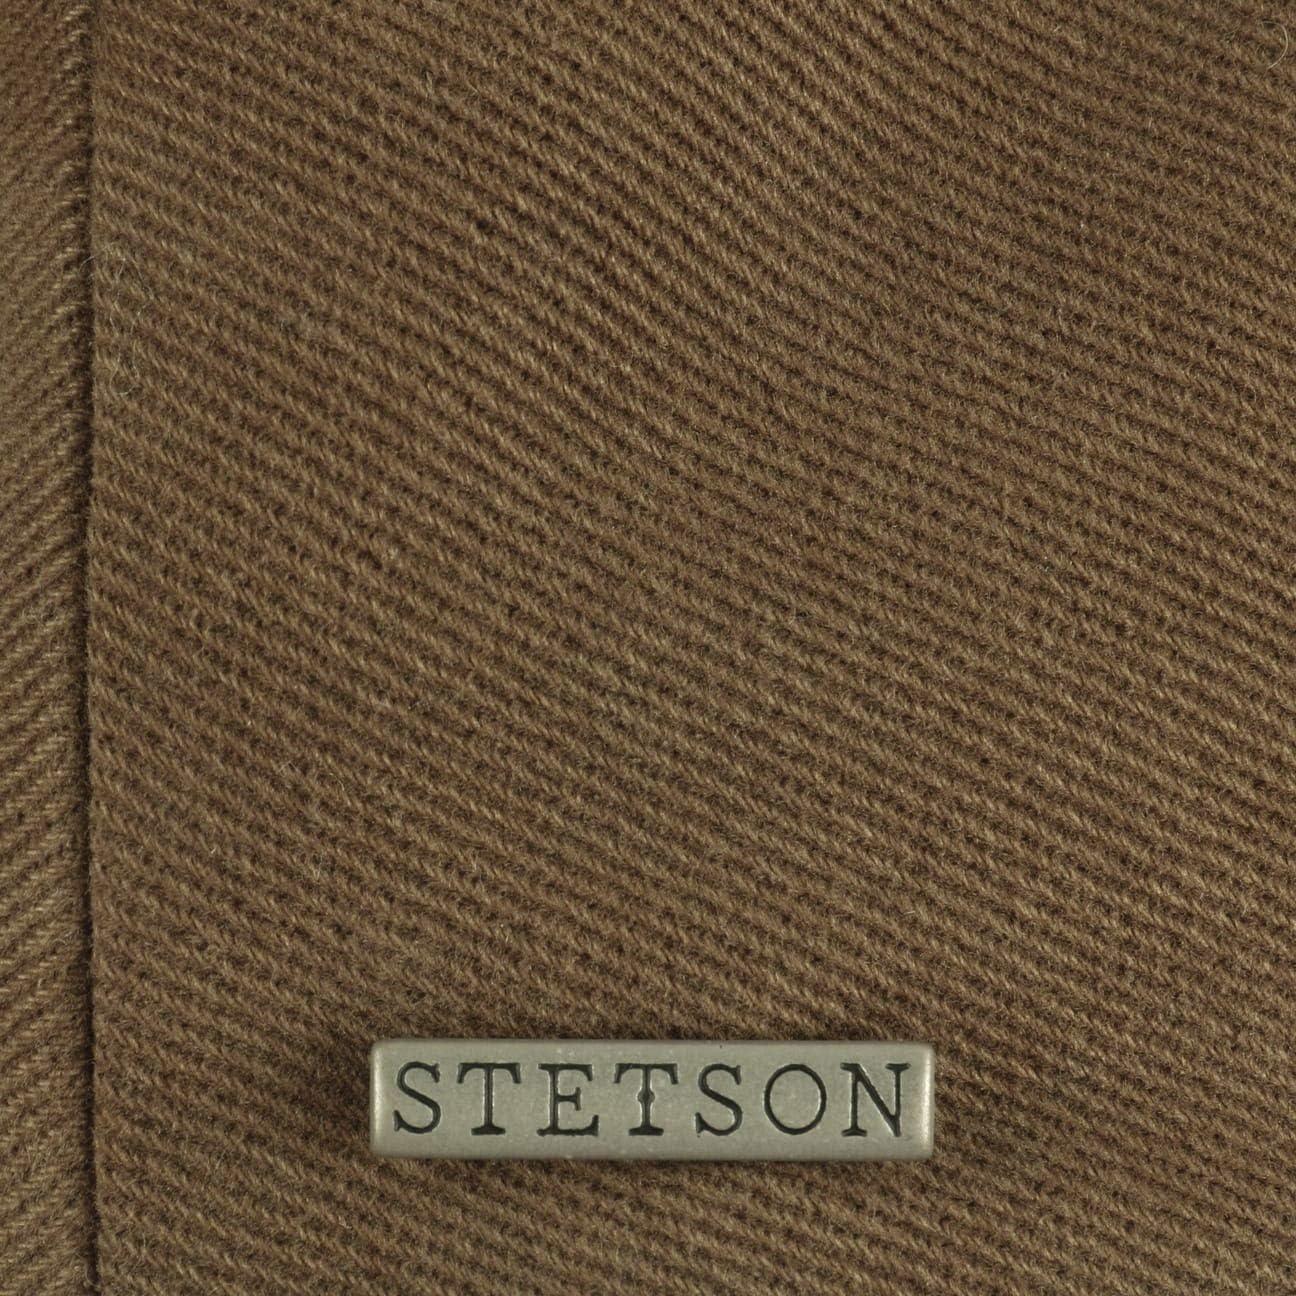 Stetson Kent Soft Cotton Flatcap Schirmm/ütze Schieberm/ütze Baumwollcap Herren Made in The EU mit Schirm Futter Herbst-Winter